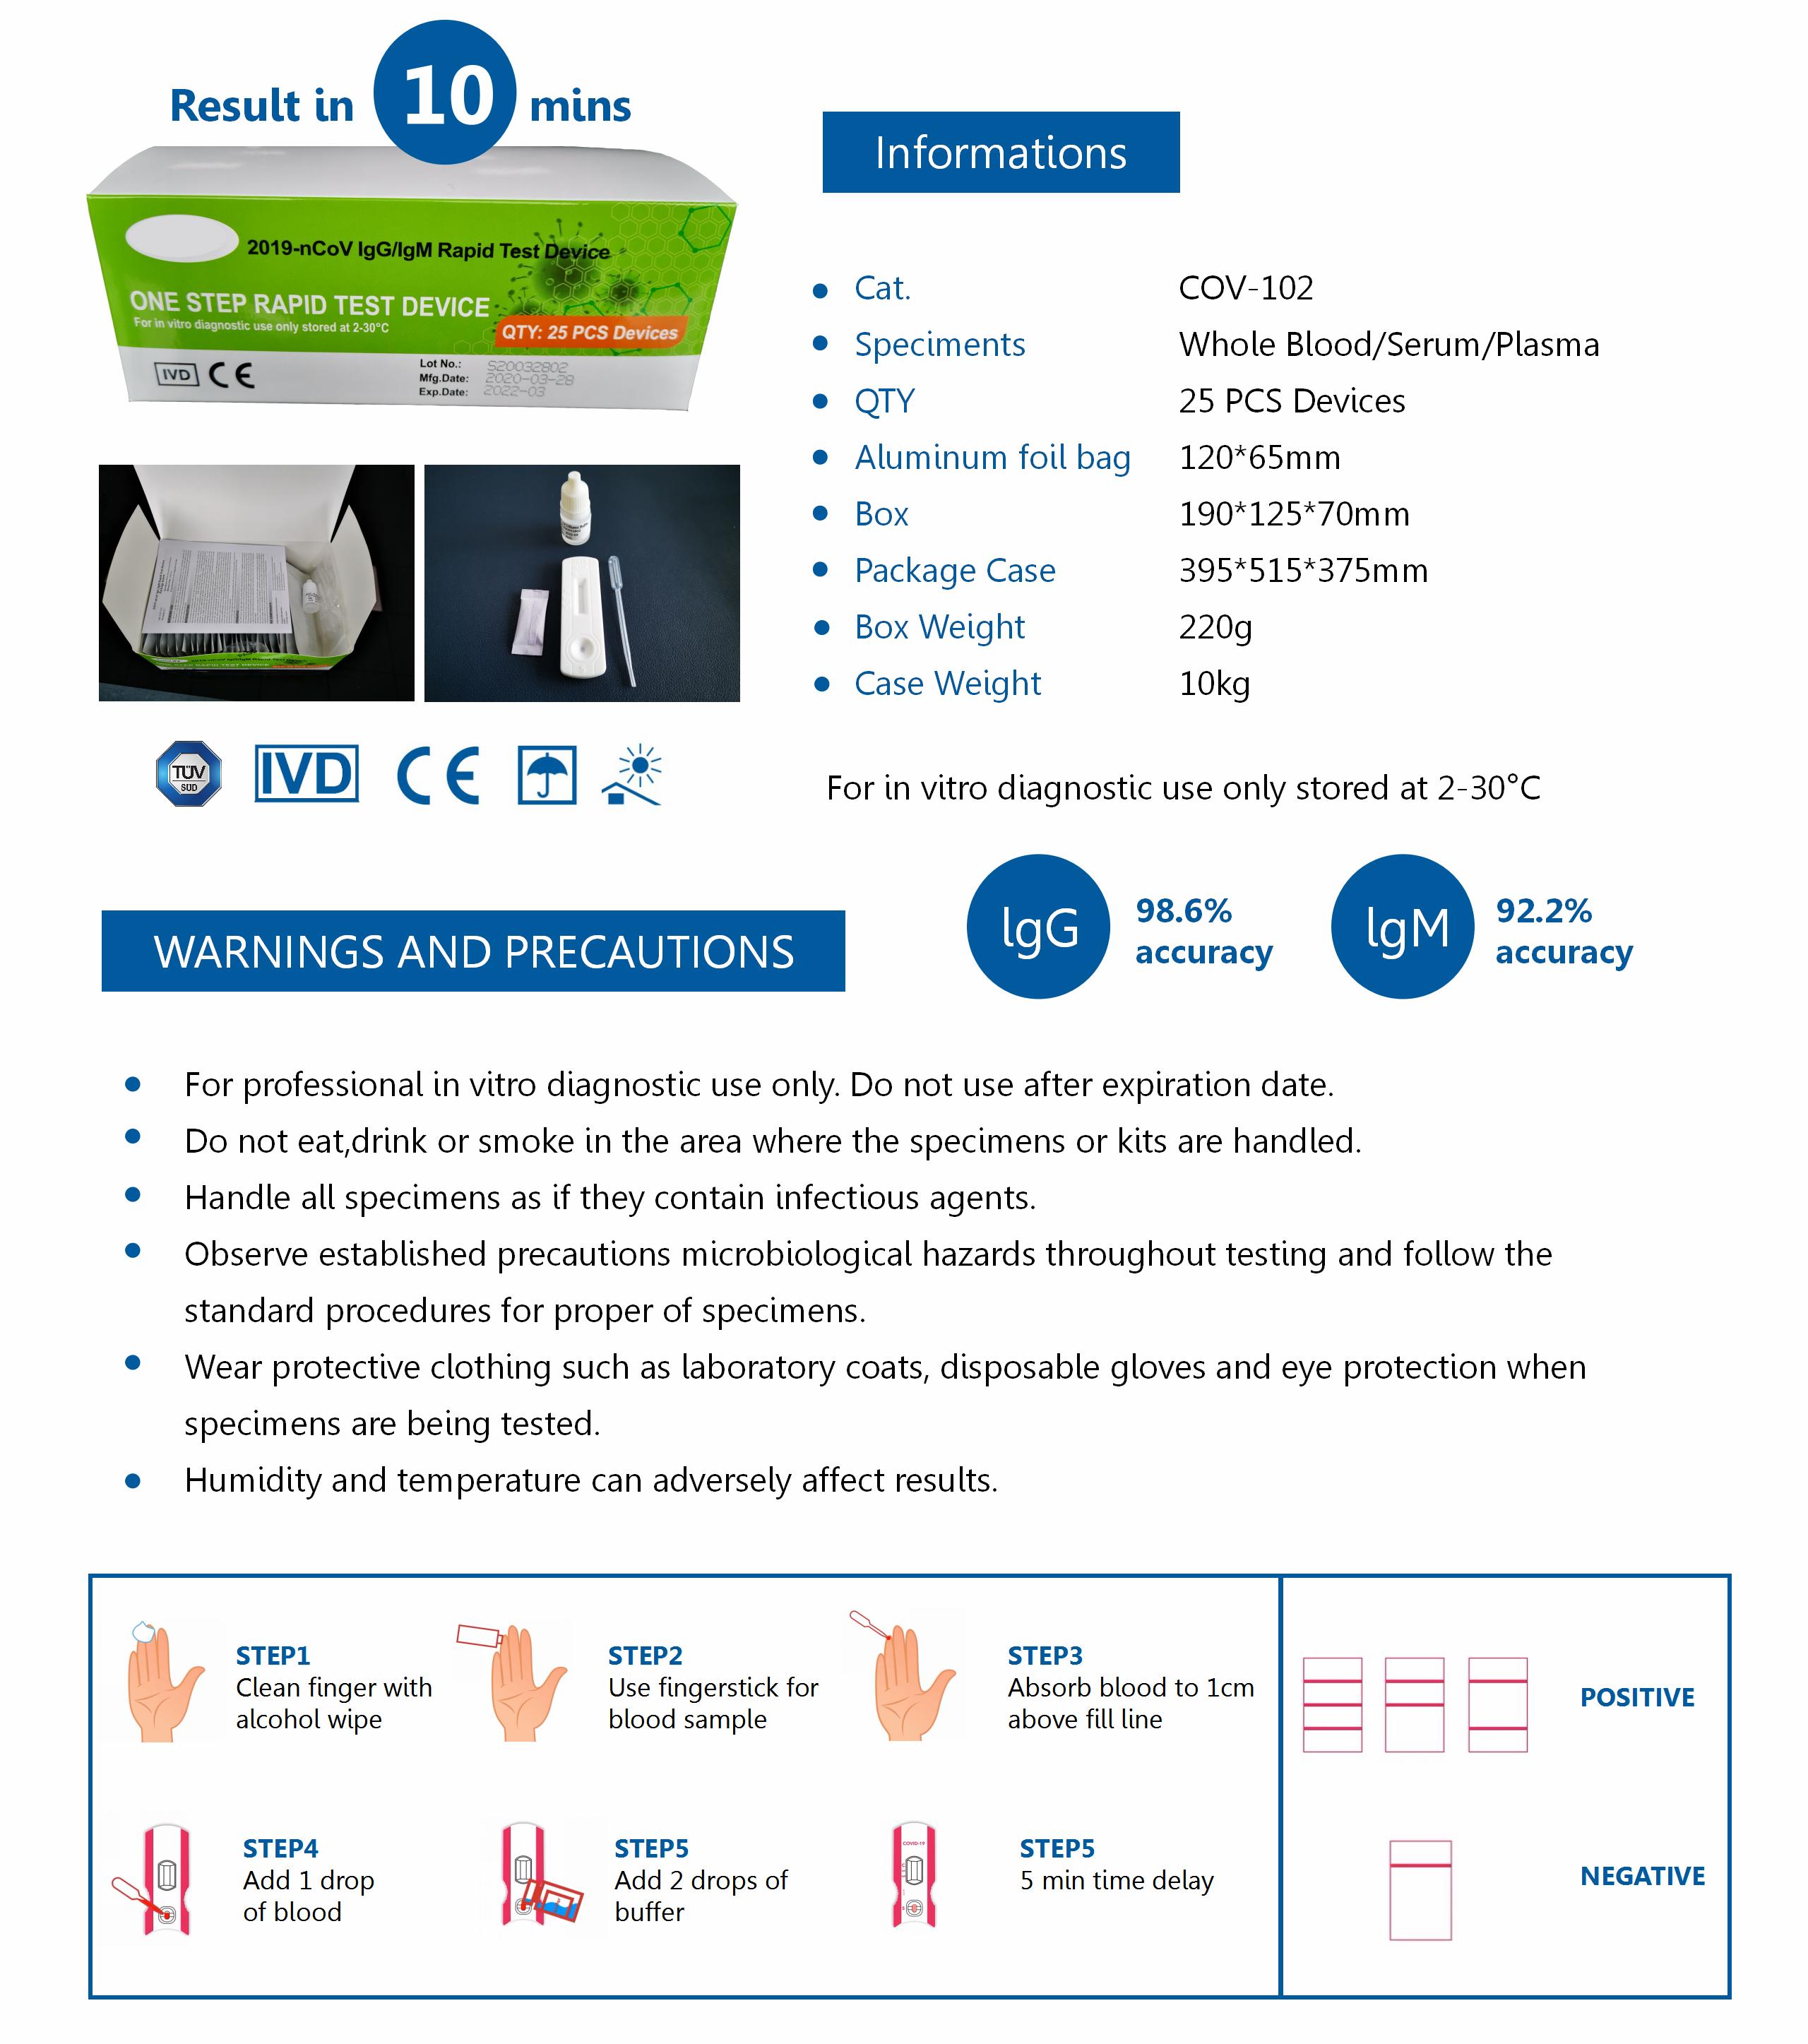 2019-nCoV lgG/lgM Rapid Test Device